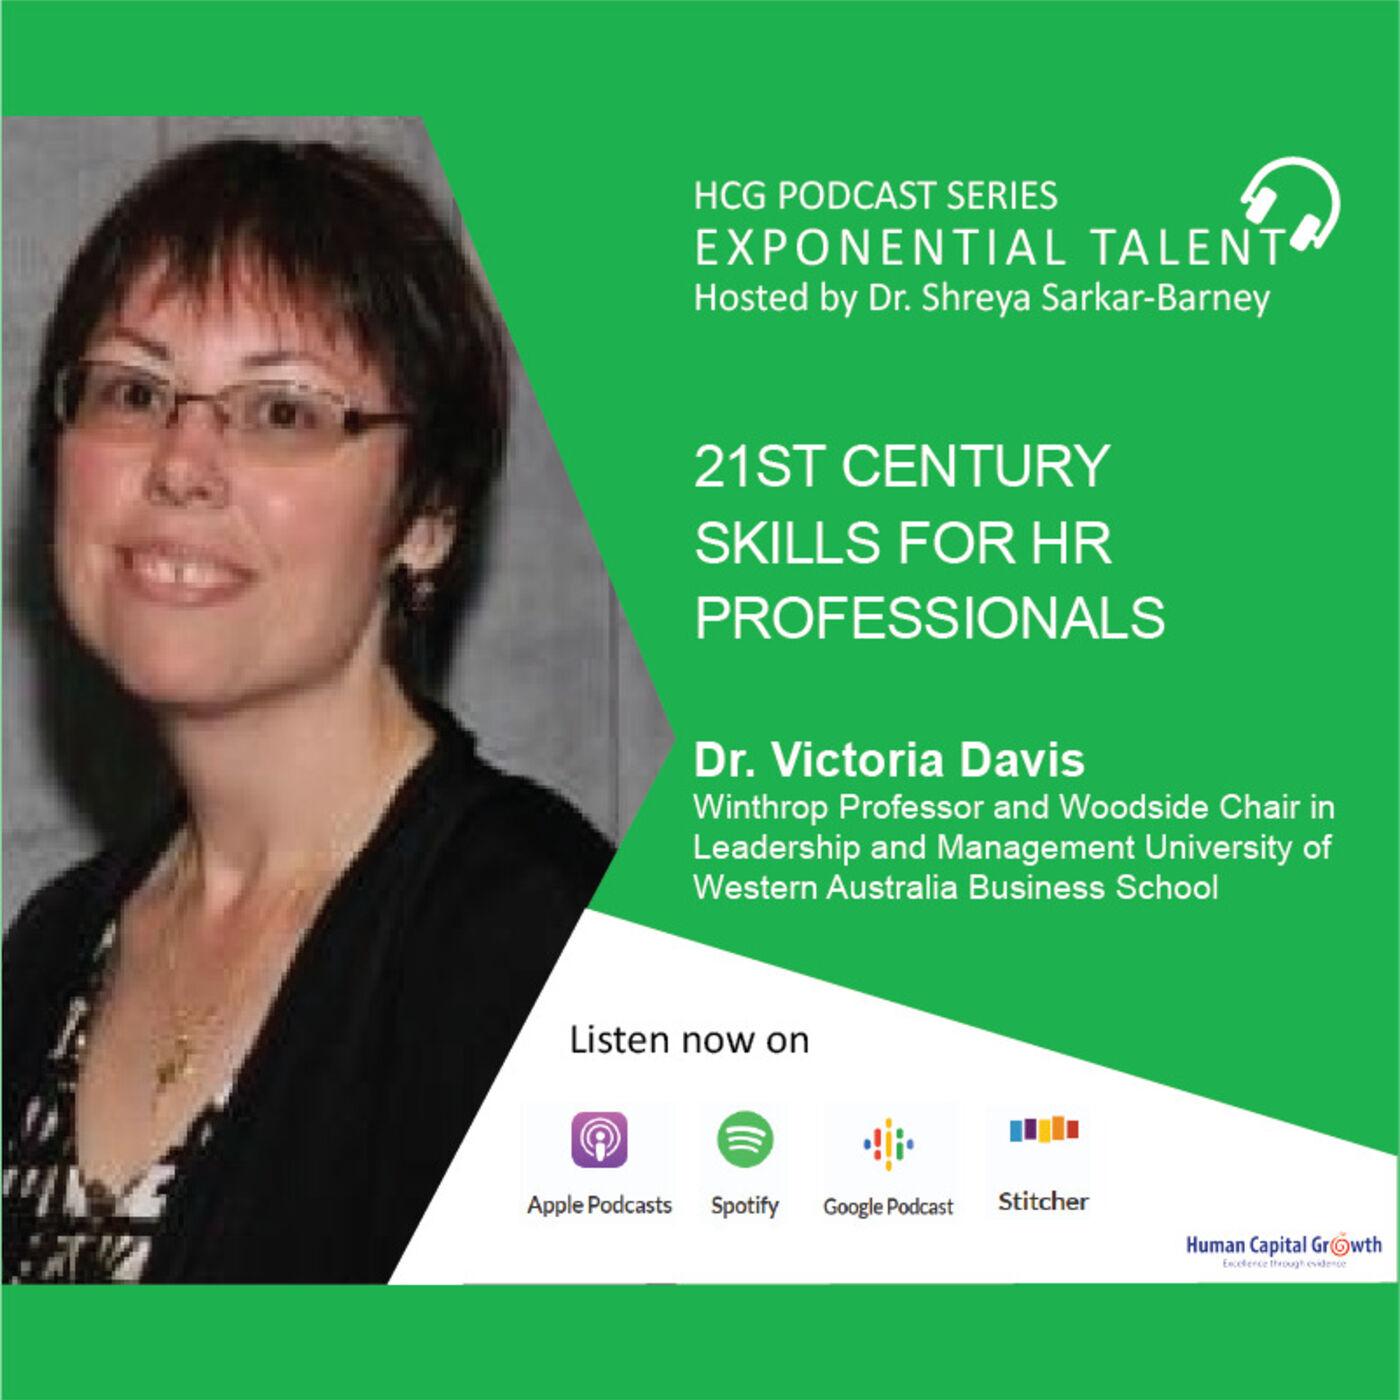 21st Century Skills for HR Professionals